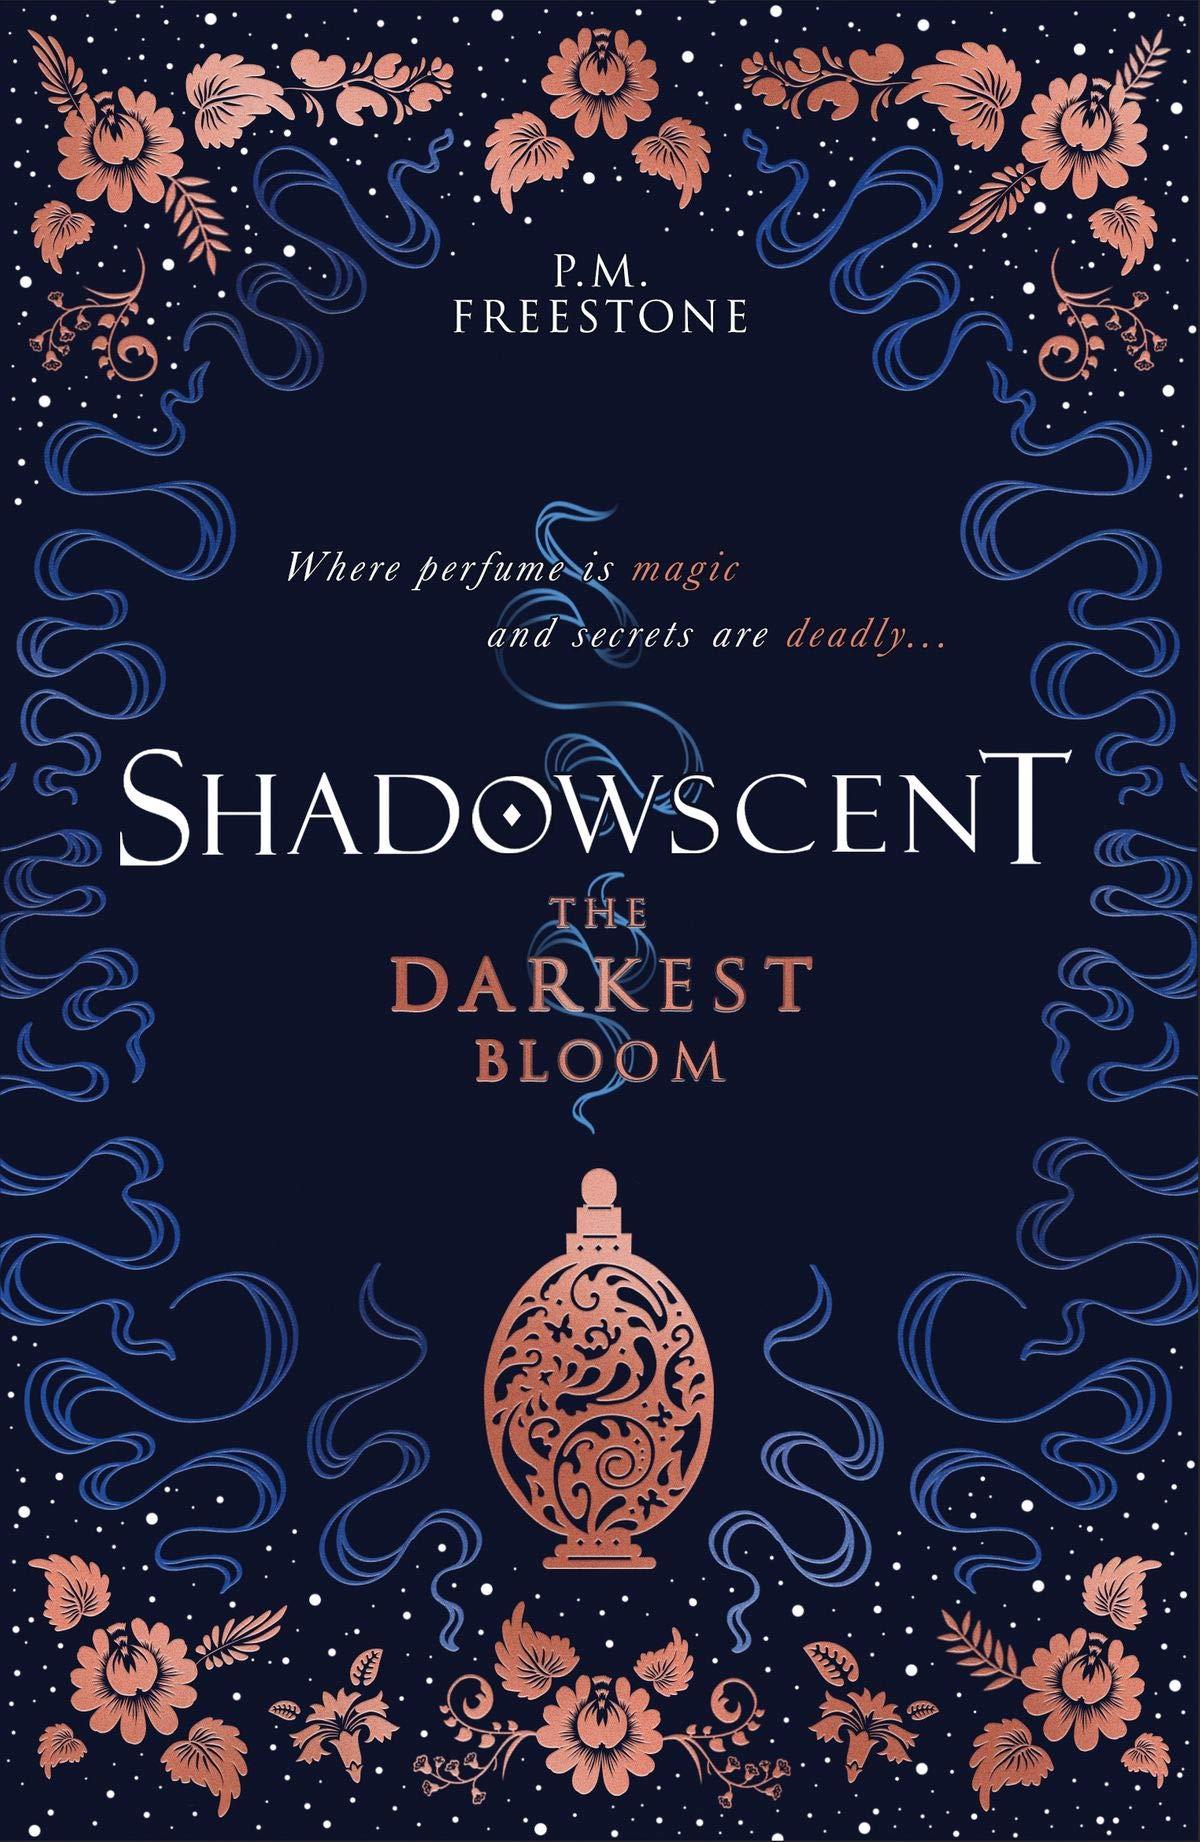 Amazon.com: Shadowscent: The Darkest Bloom: 9781407192154: Freestone, P M:  Books